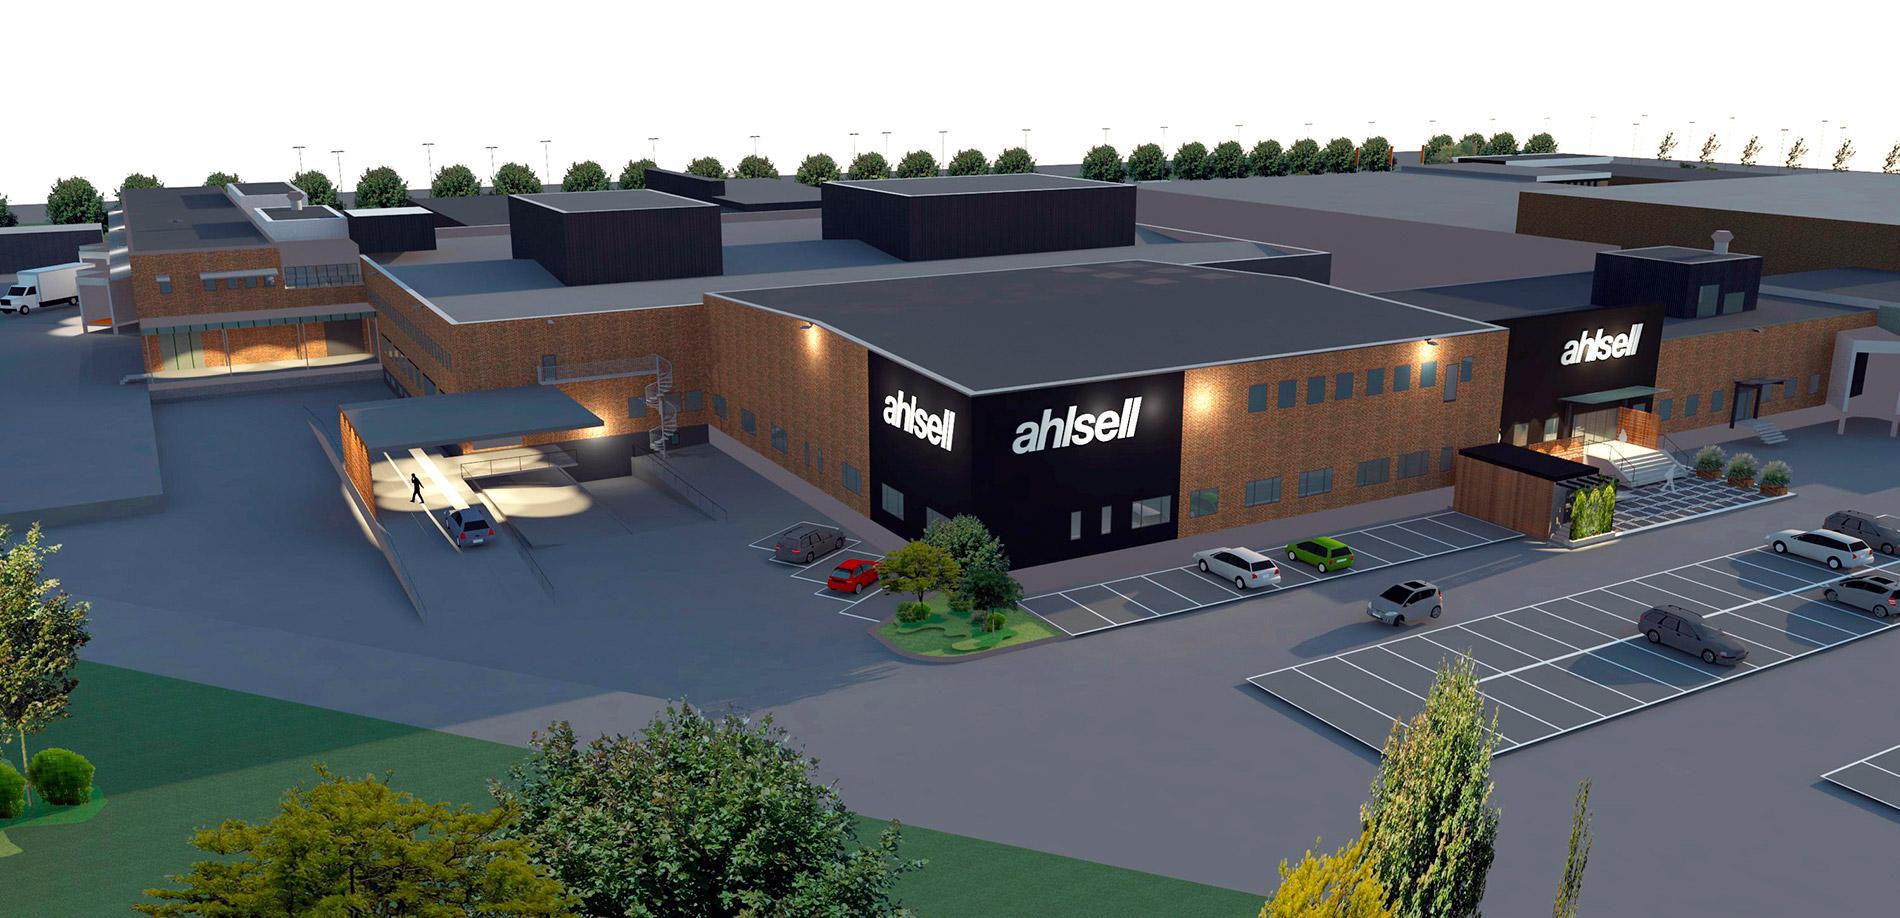 Arkitektskiss över Ahlsells nya yrkesbutik i Norrköping